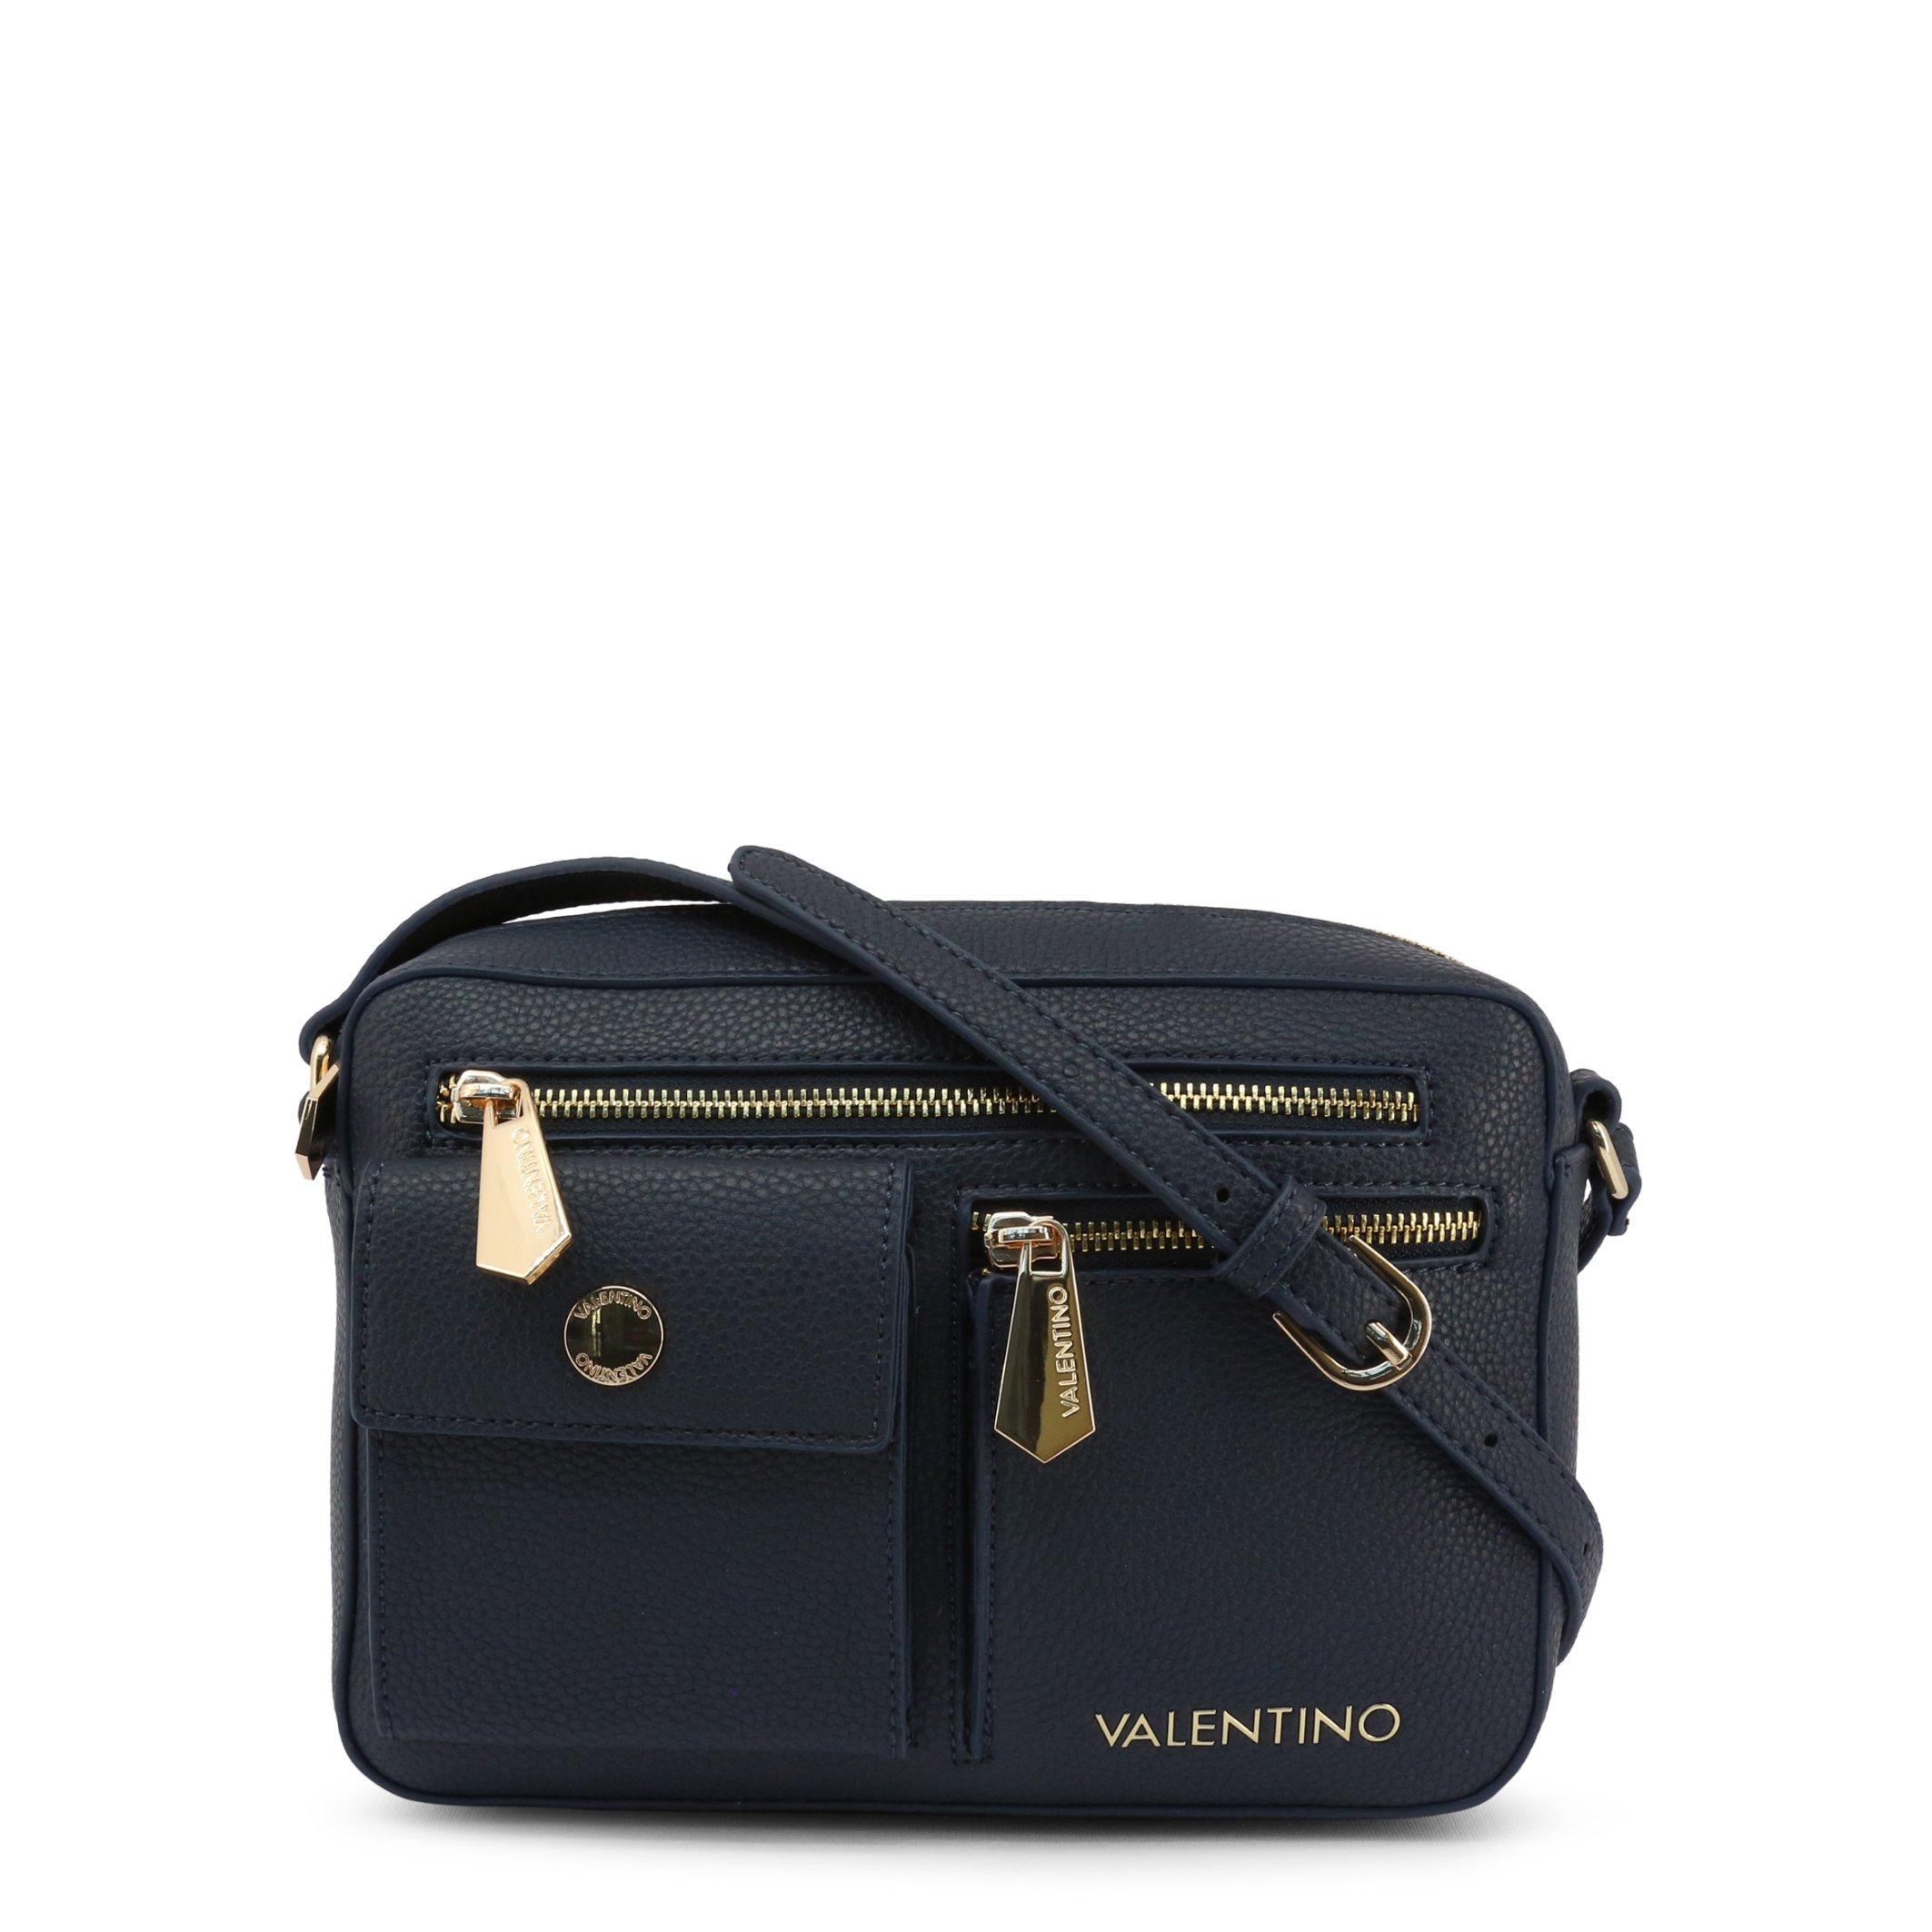 Valentino by Mario Valentino Women's Clutch Bag Various Colours CASPER-VBS3XL03 - blue NOSIZE